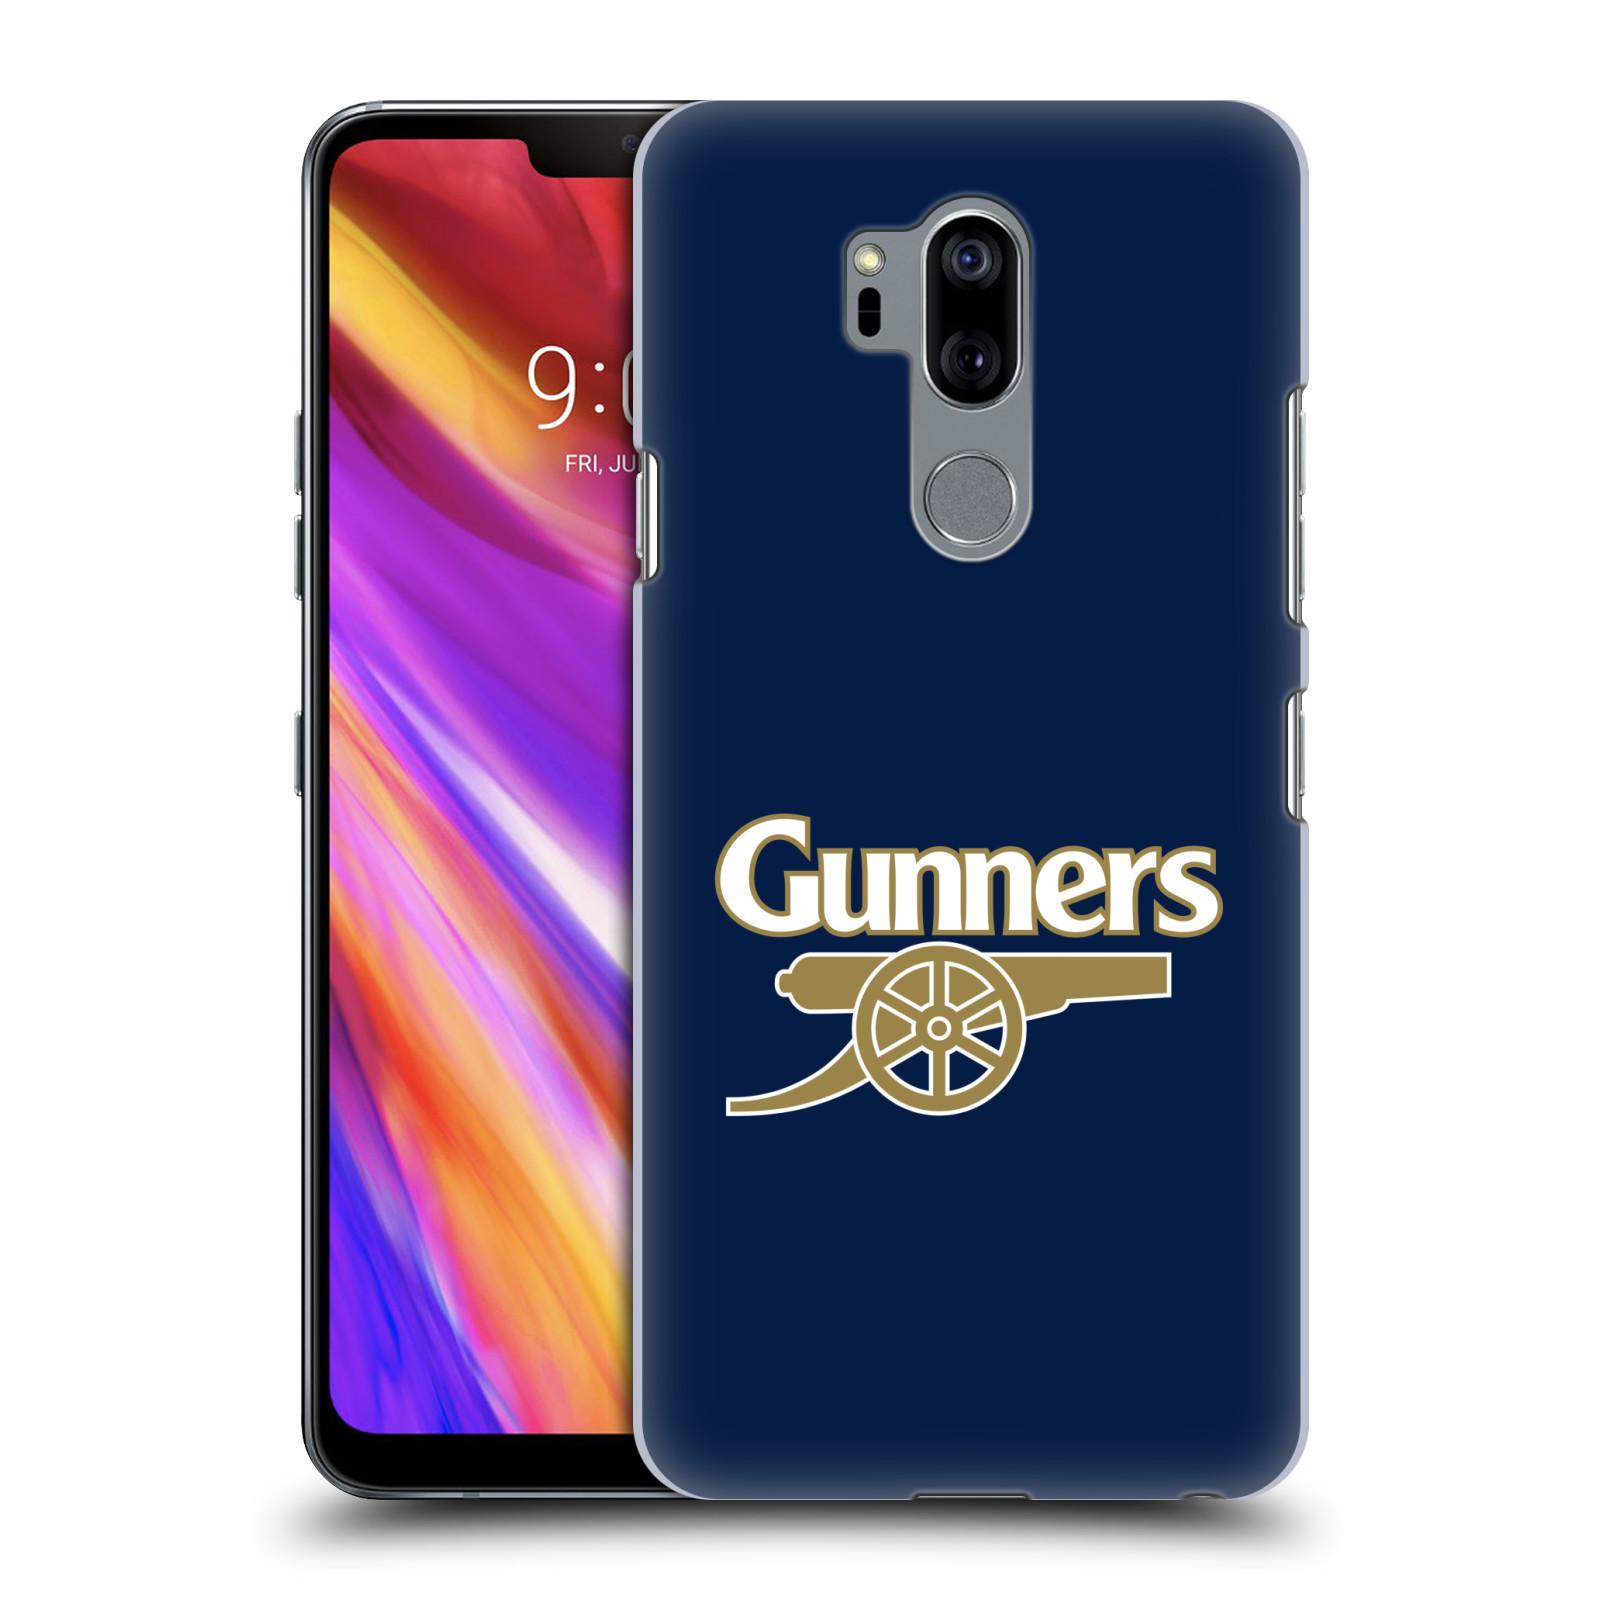 Plastové pouzdro na mobil LG G7 ThinQ - Head Case - Arsenal FC - Gunners